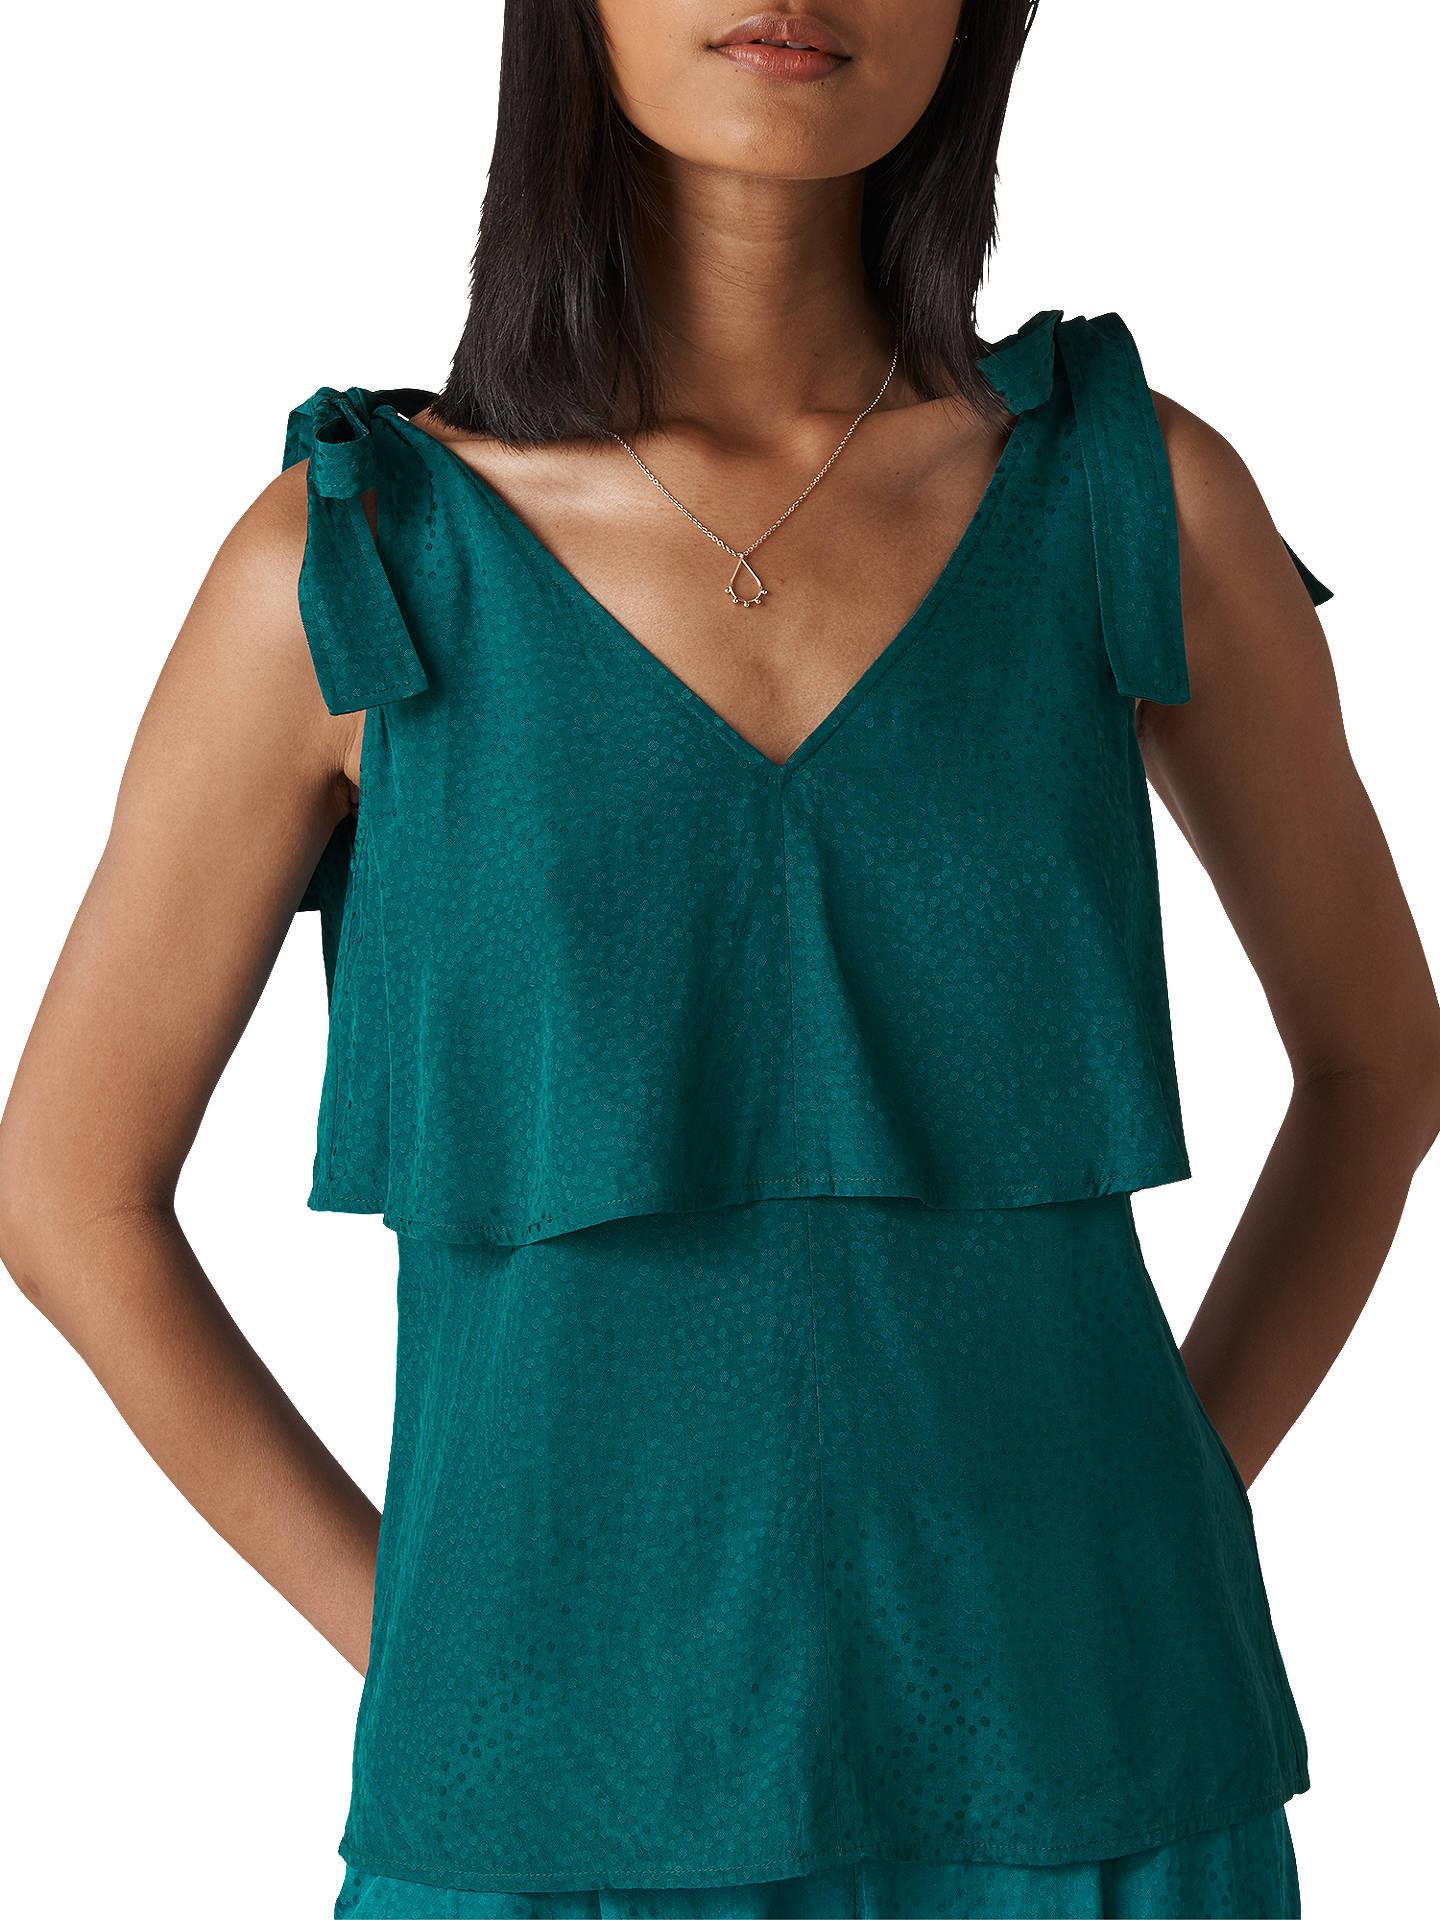 f3391d9d5b60 Buy Whistles Jacquard Tie Shoulder Top, Green, 6 Online at johnlewis.com ...